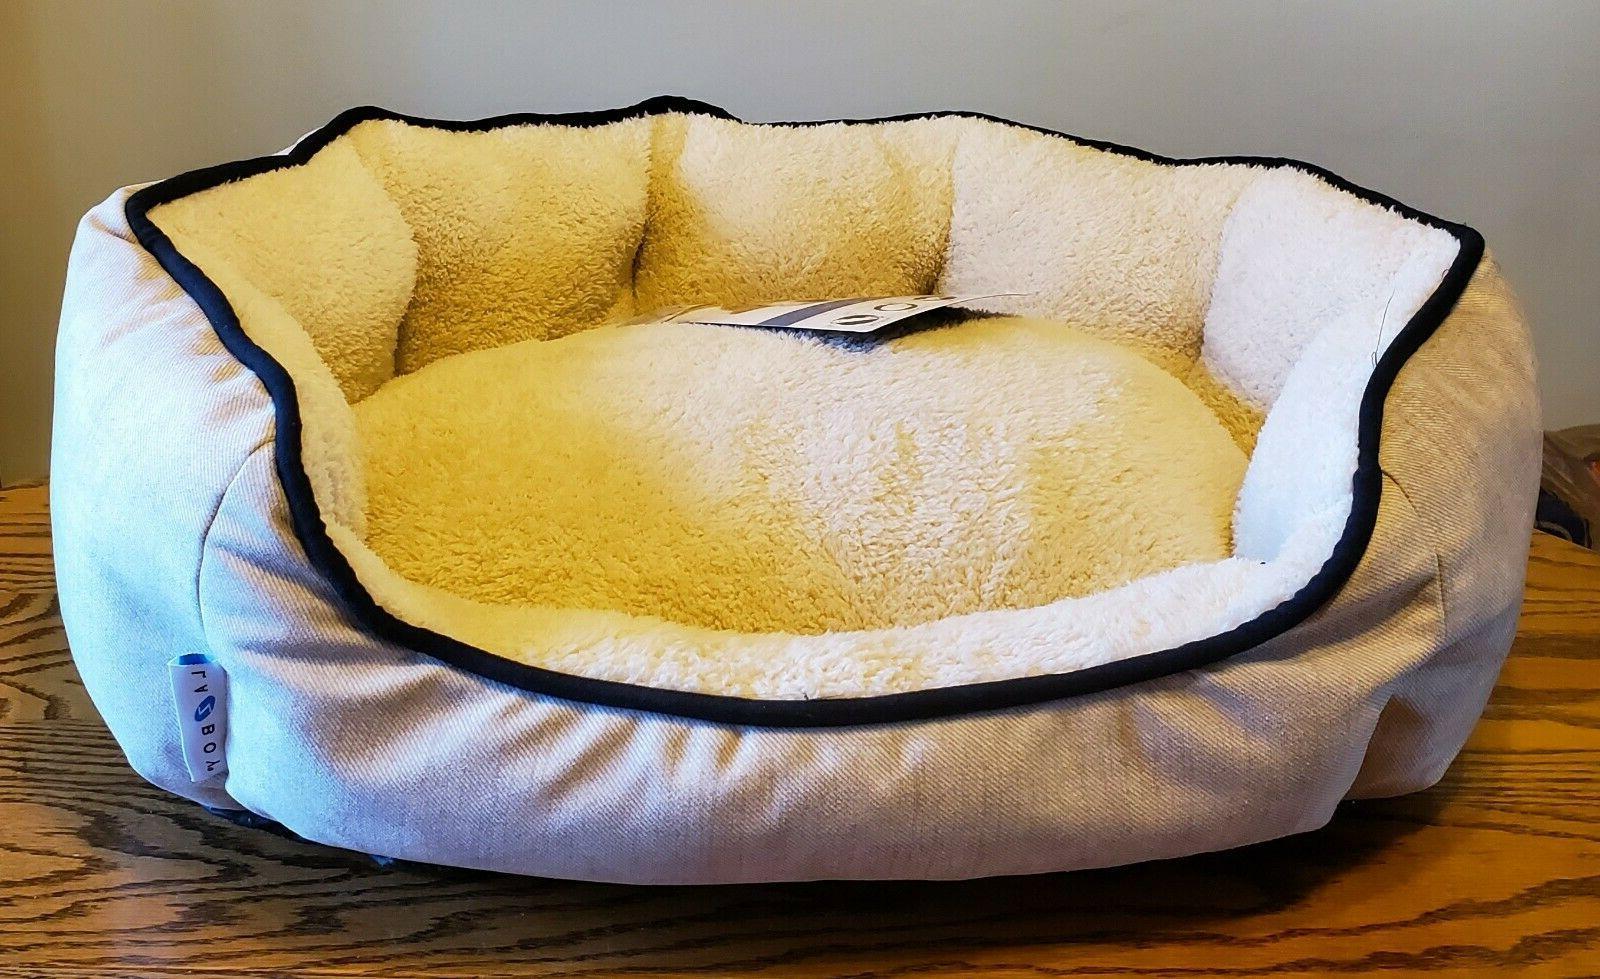 genuine la z boy lounger dog bed